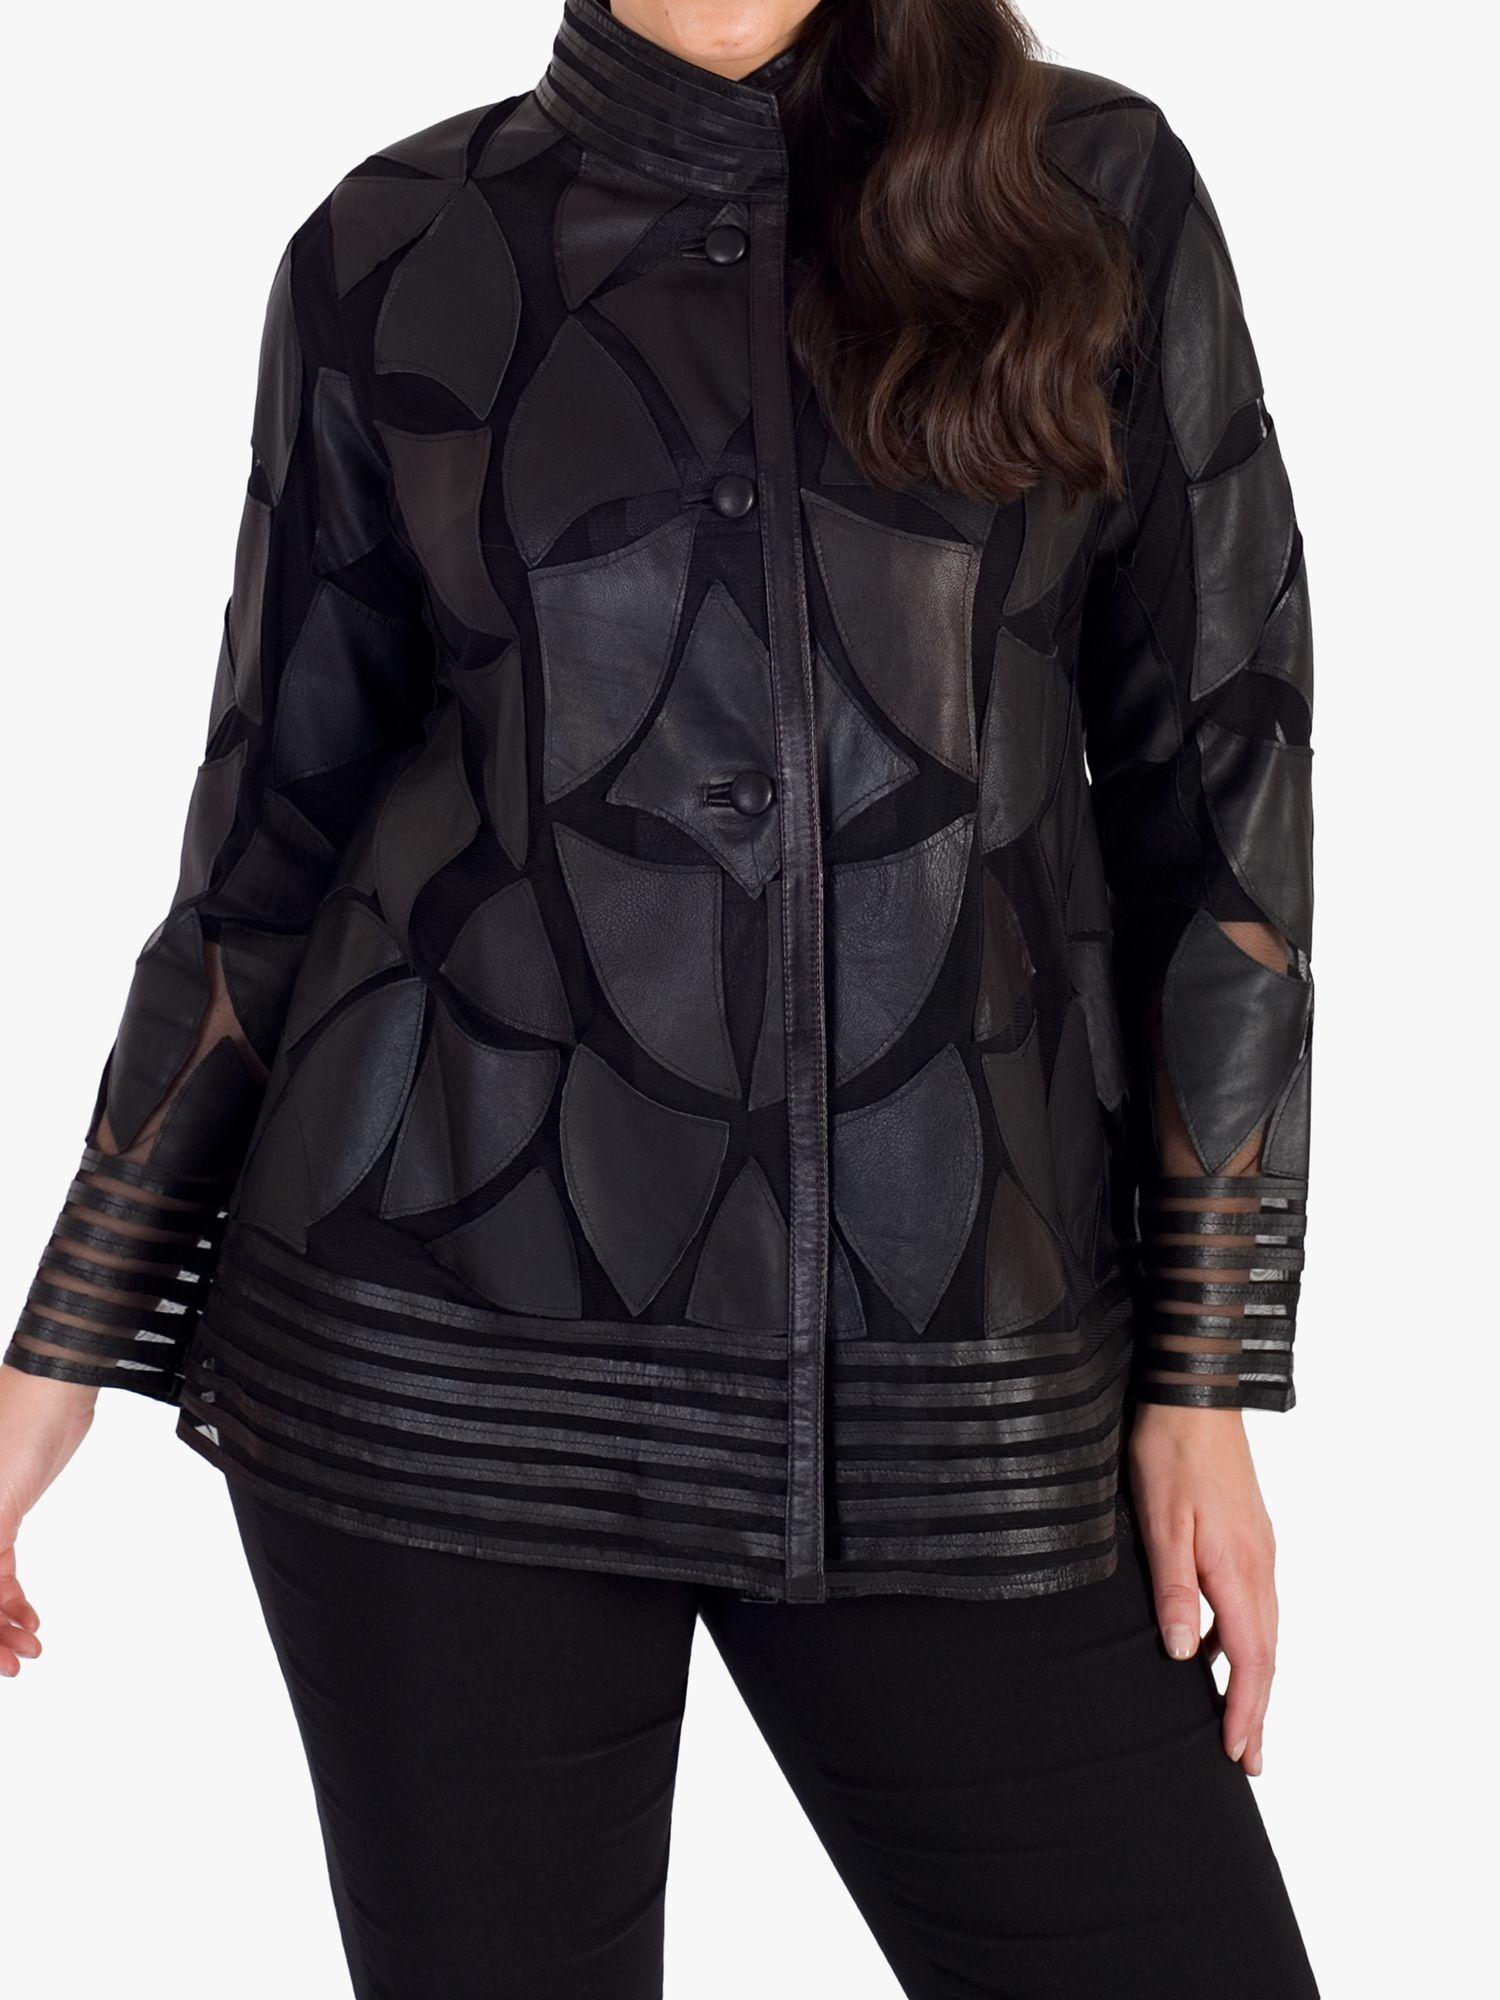 Chesca chesca Applique Patch Leather Jacket, Black